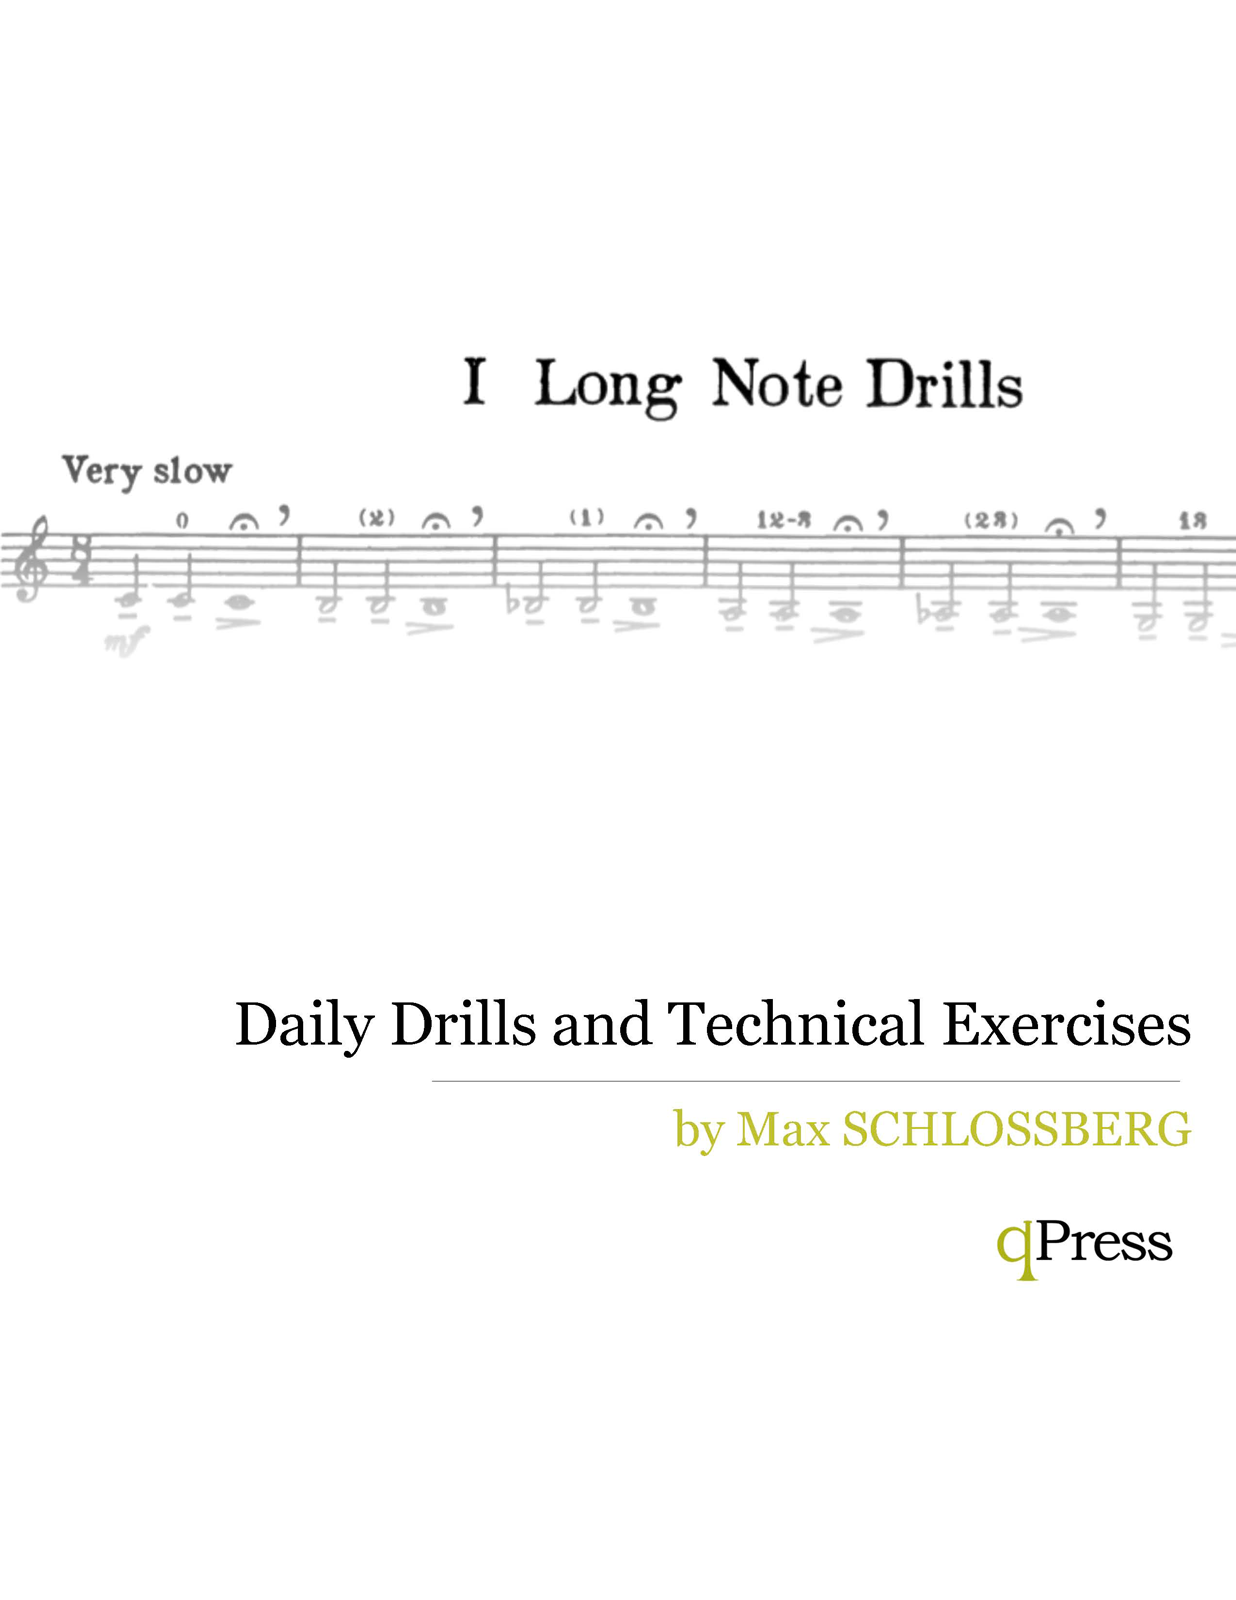 Max schlossberg trumpet pdf